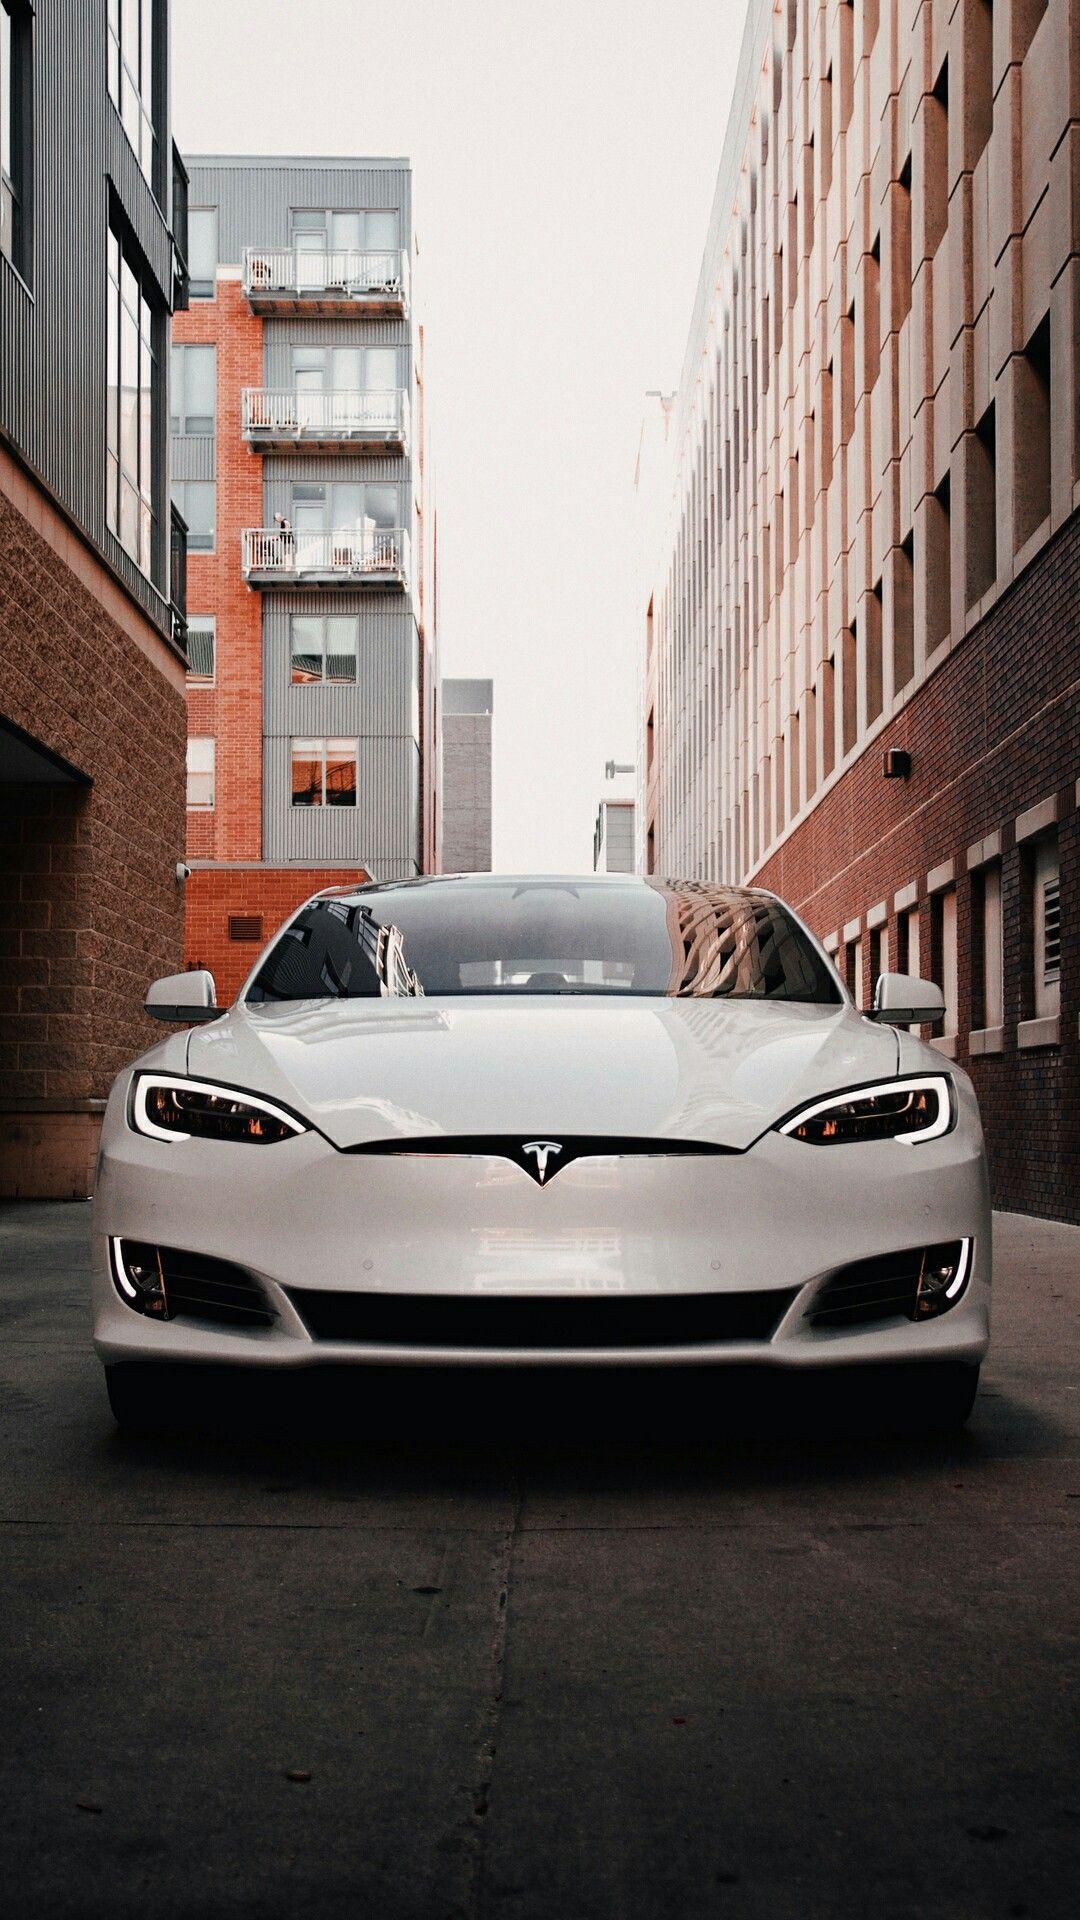 Pin by Derek Sember on Tesla in 2020 (With images) Tesla